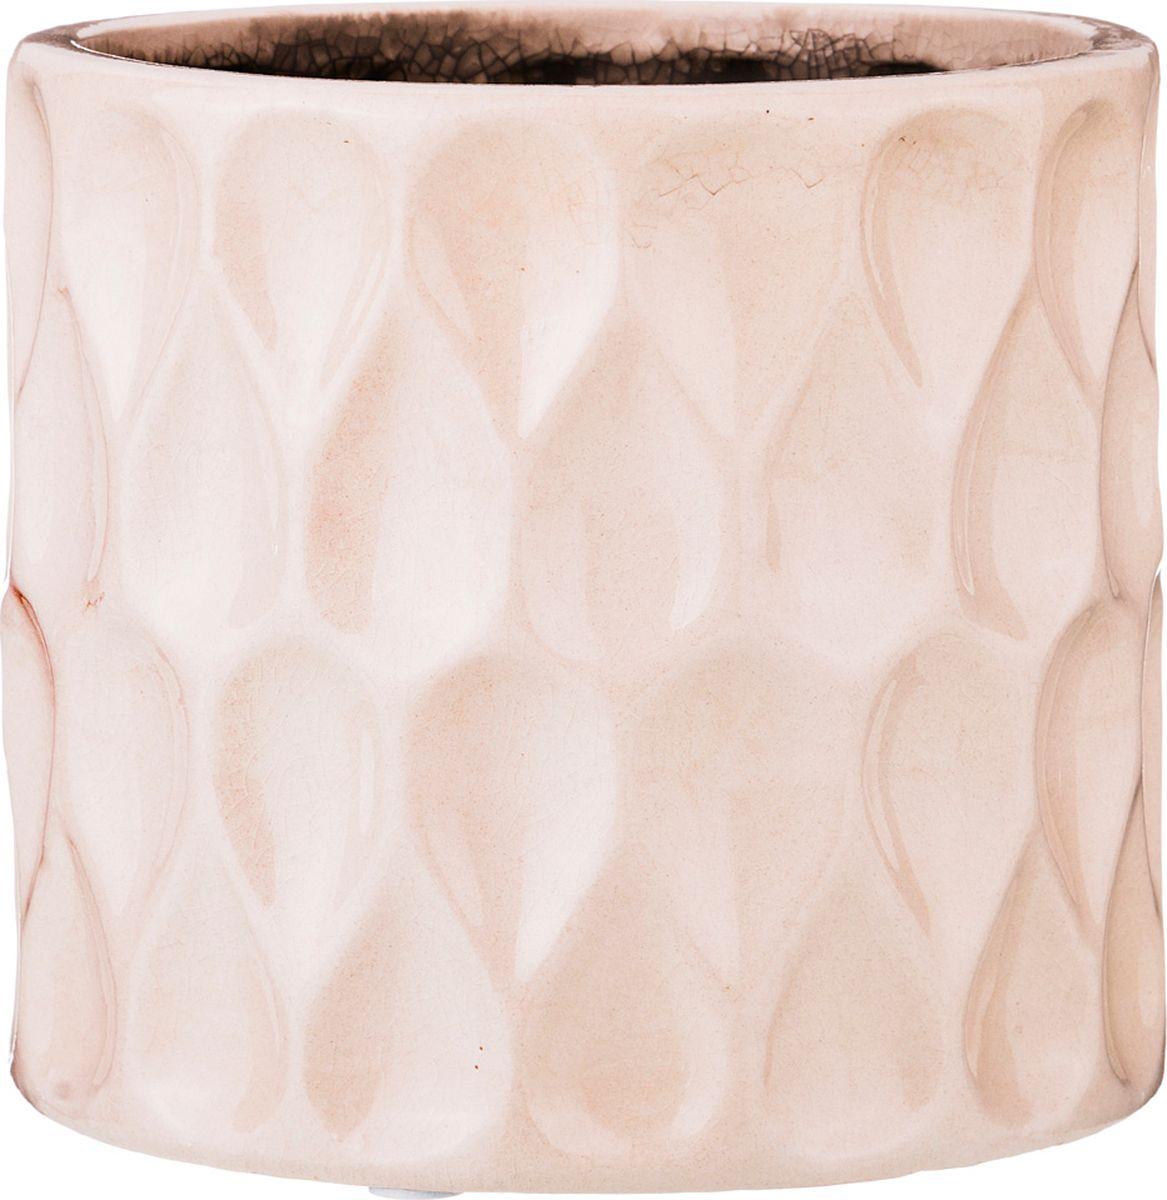 Кашпо Lefard, цвет: розовый, 14 х 14 х 13 см 14 shohoku 14